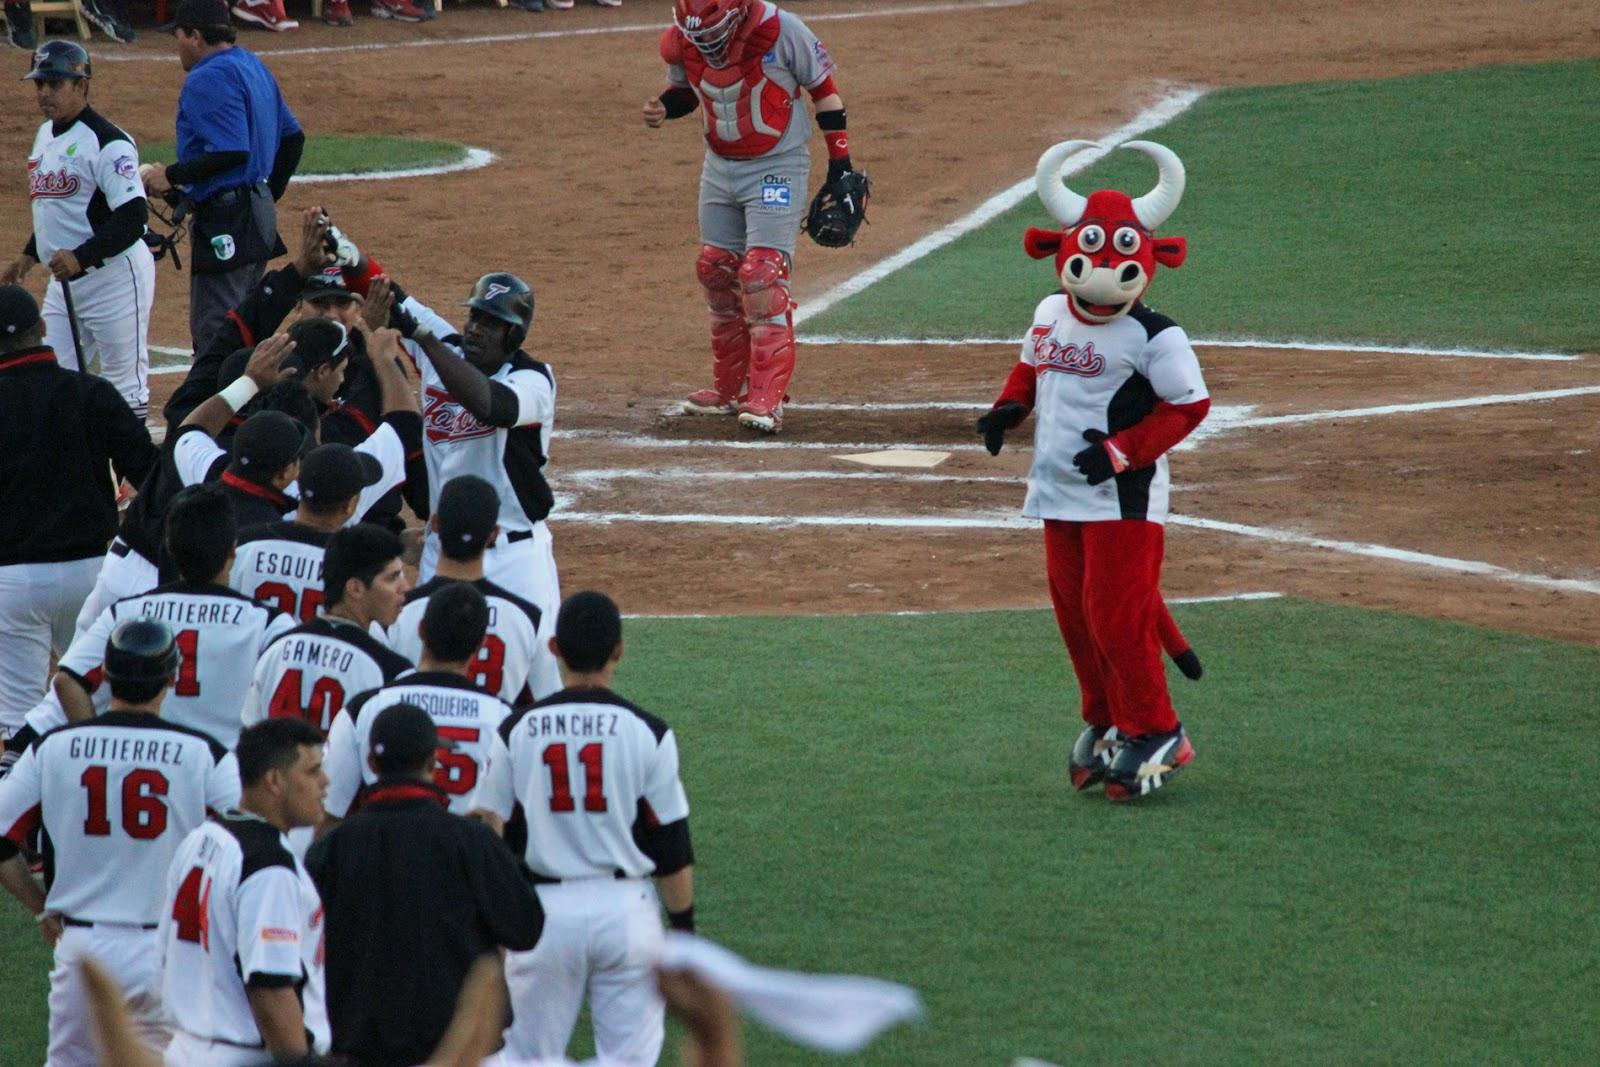 Well fix that in editing: Tijuana beisbol iswacky